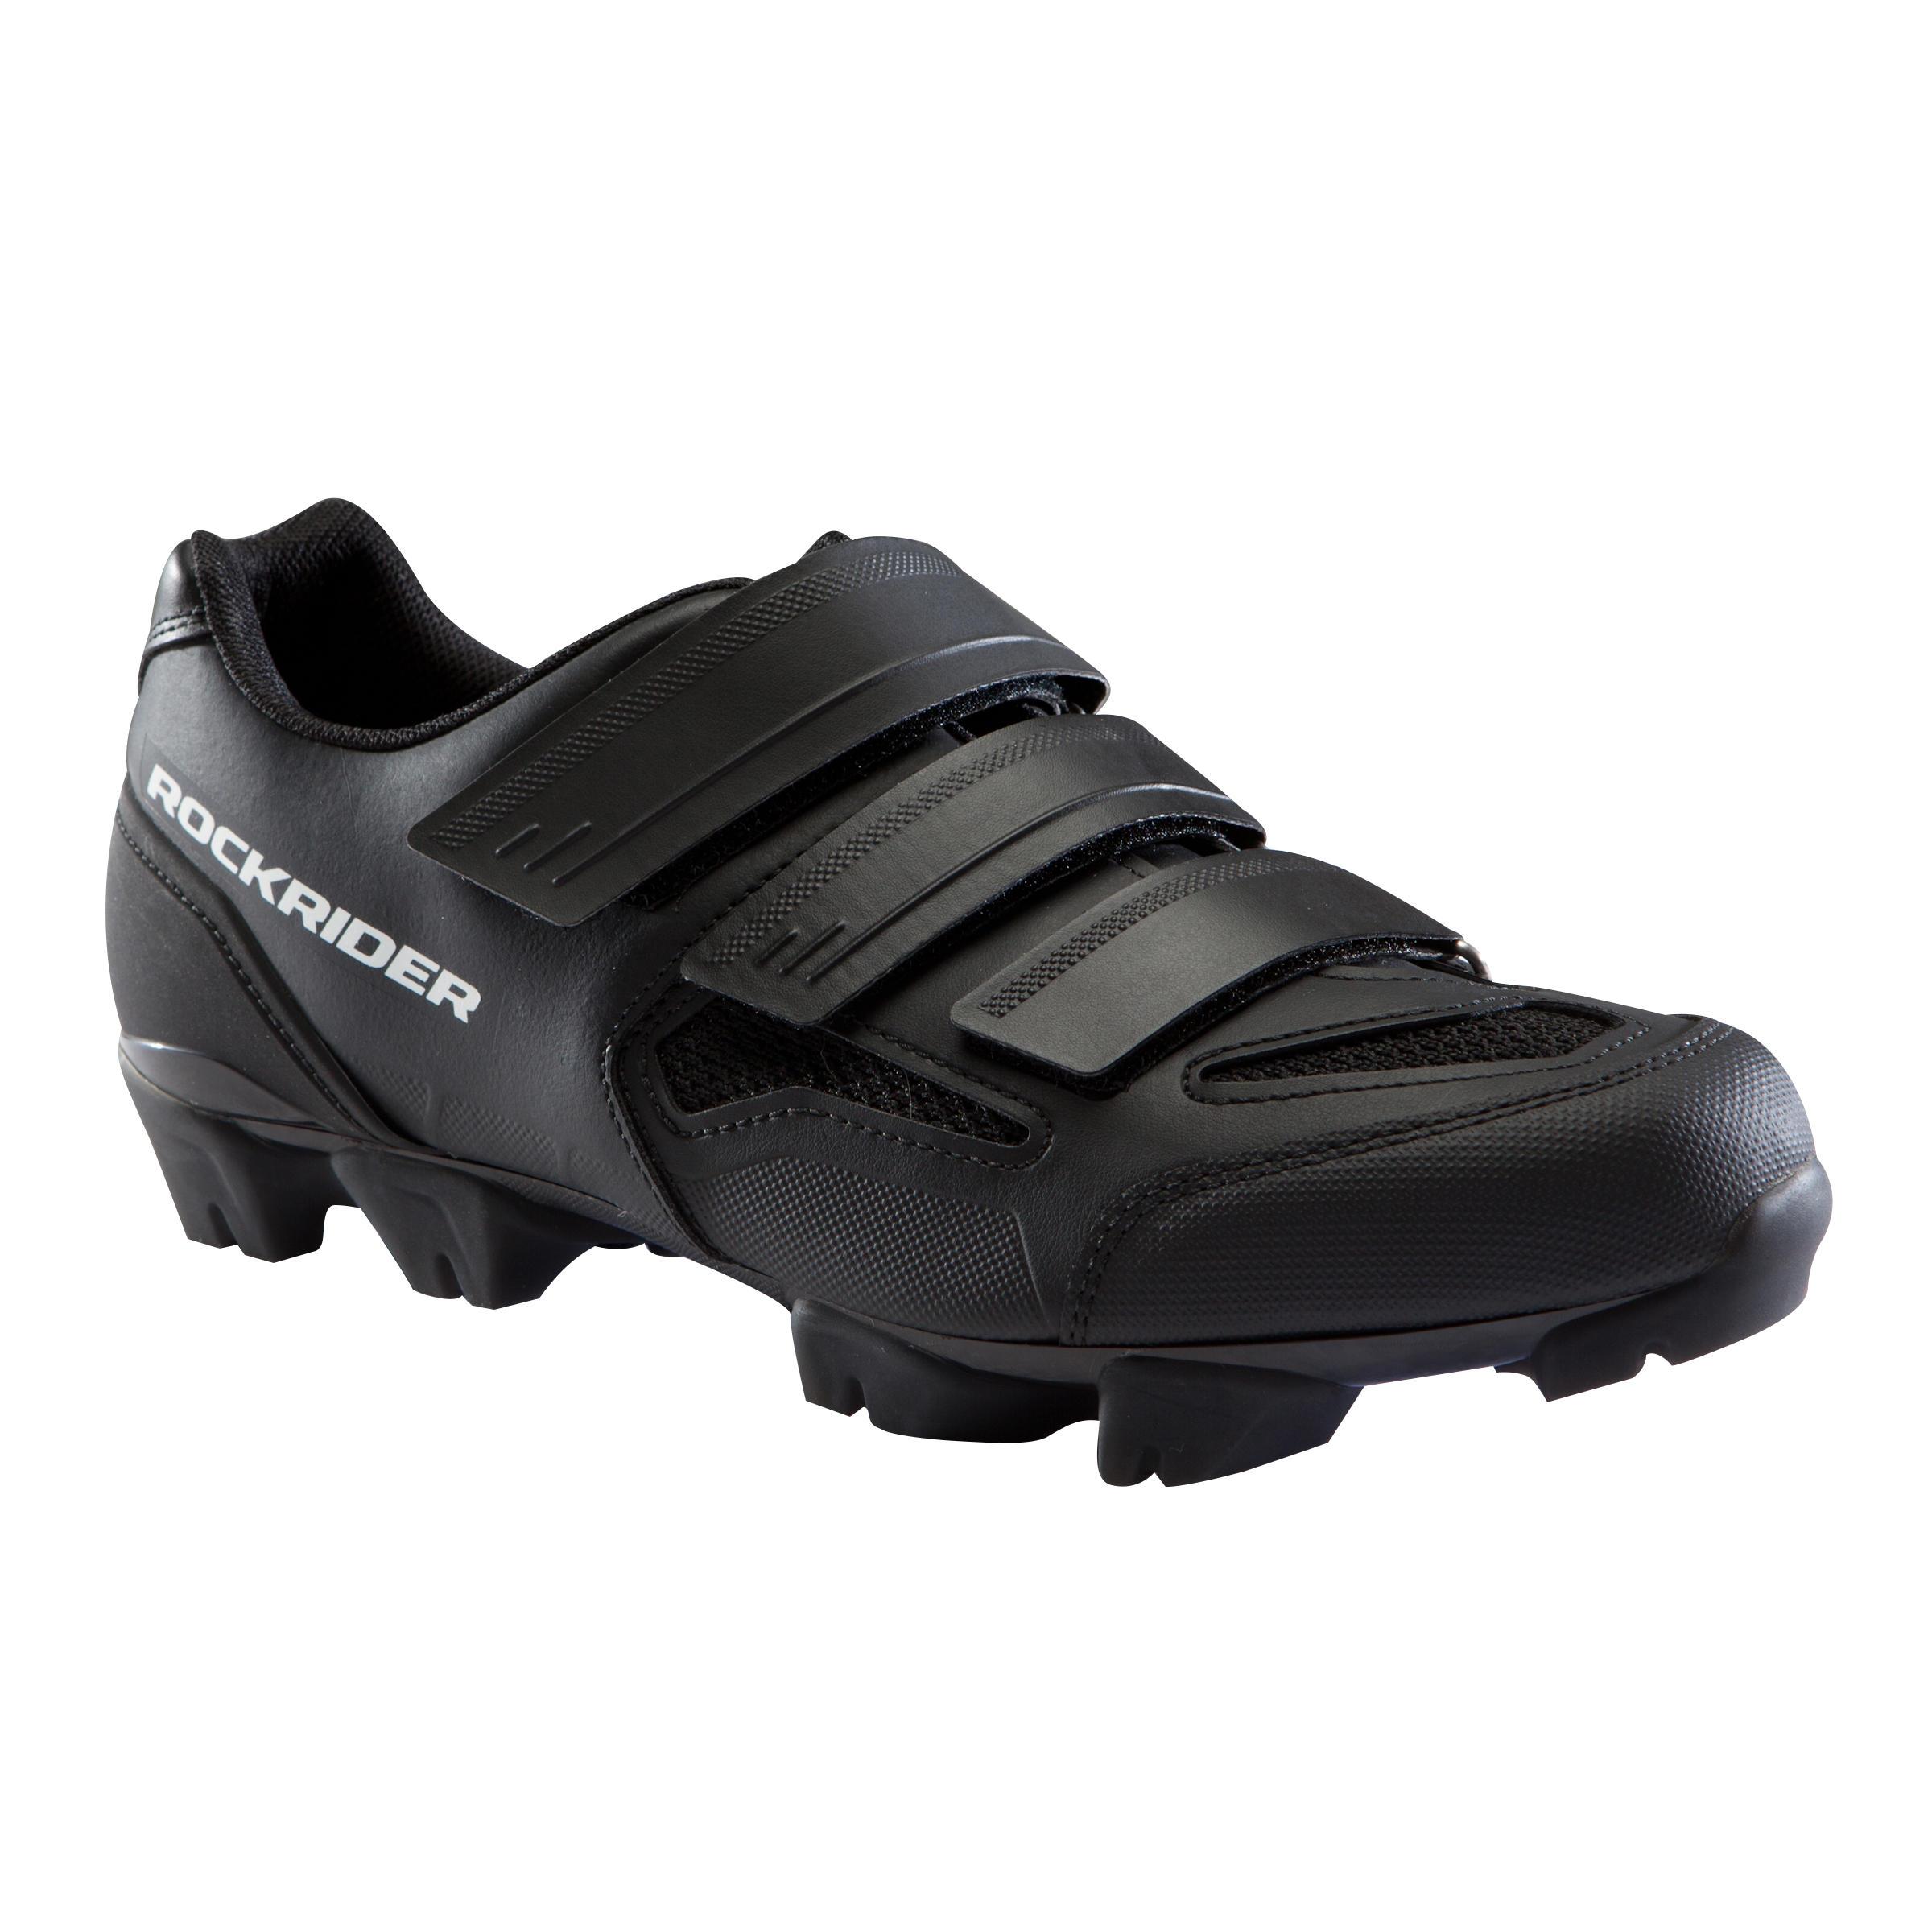 Rockrider MTB-schoenen XC 100 kopen